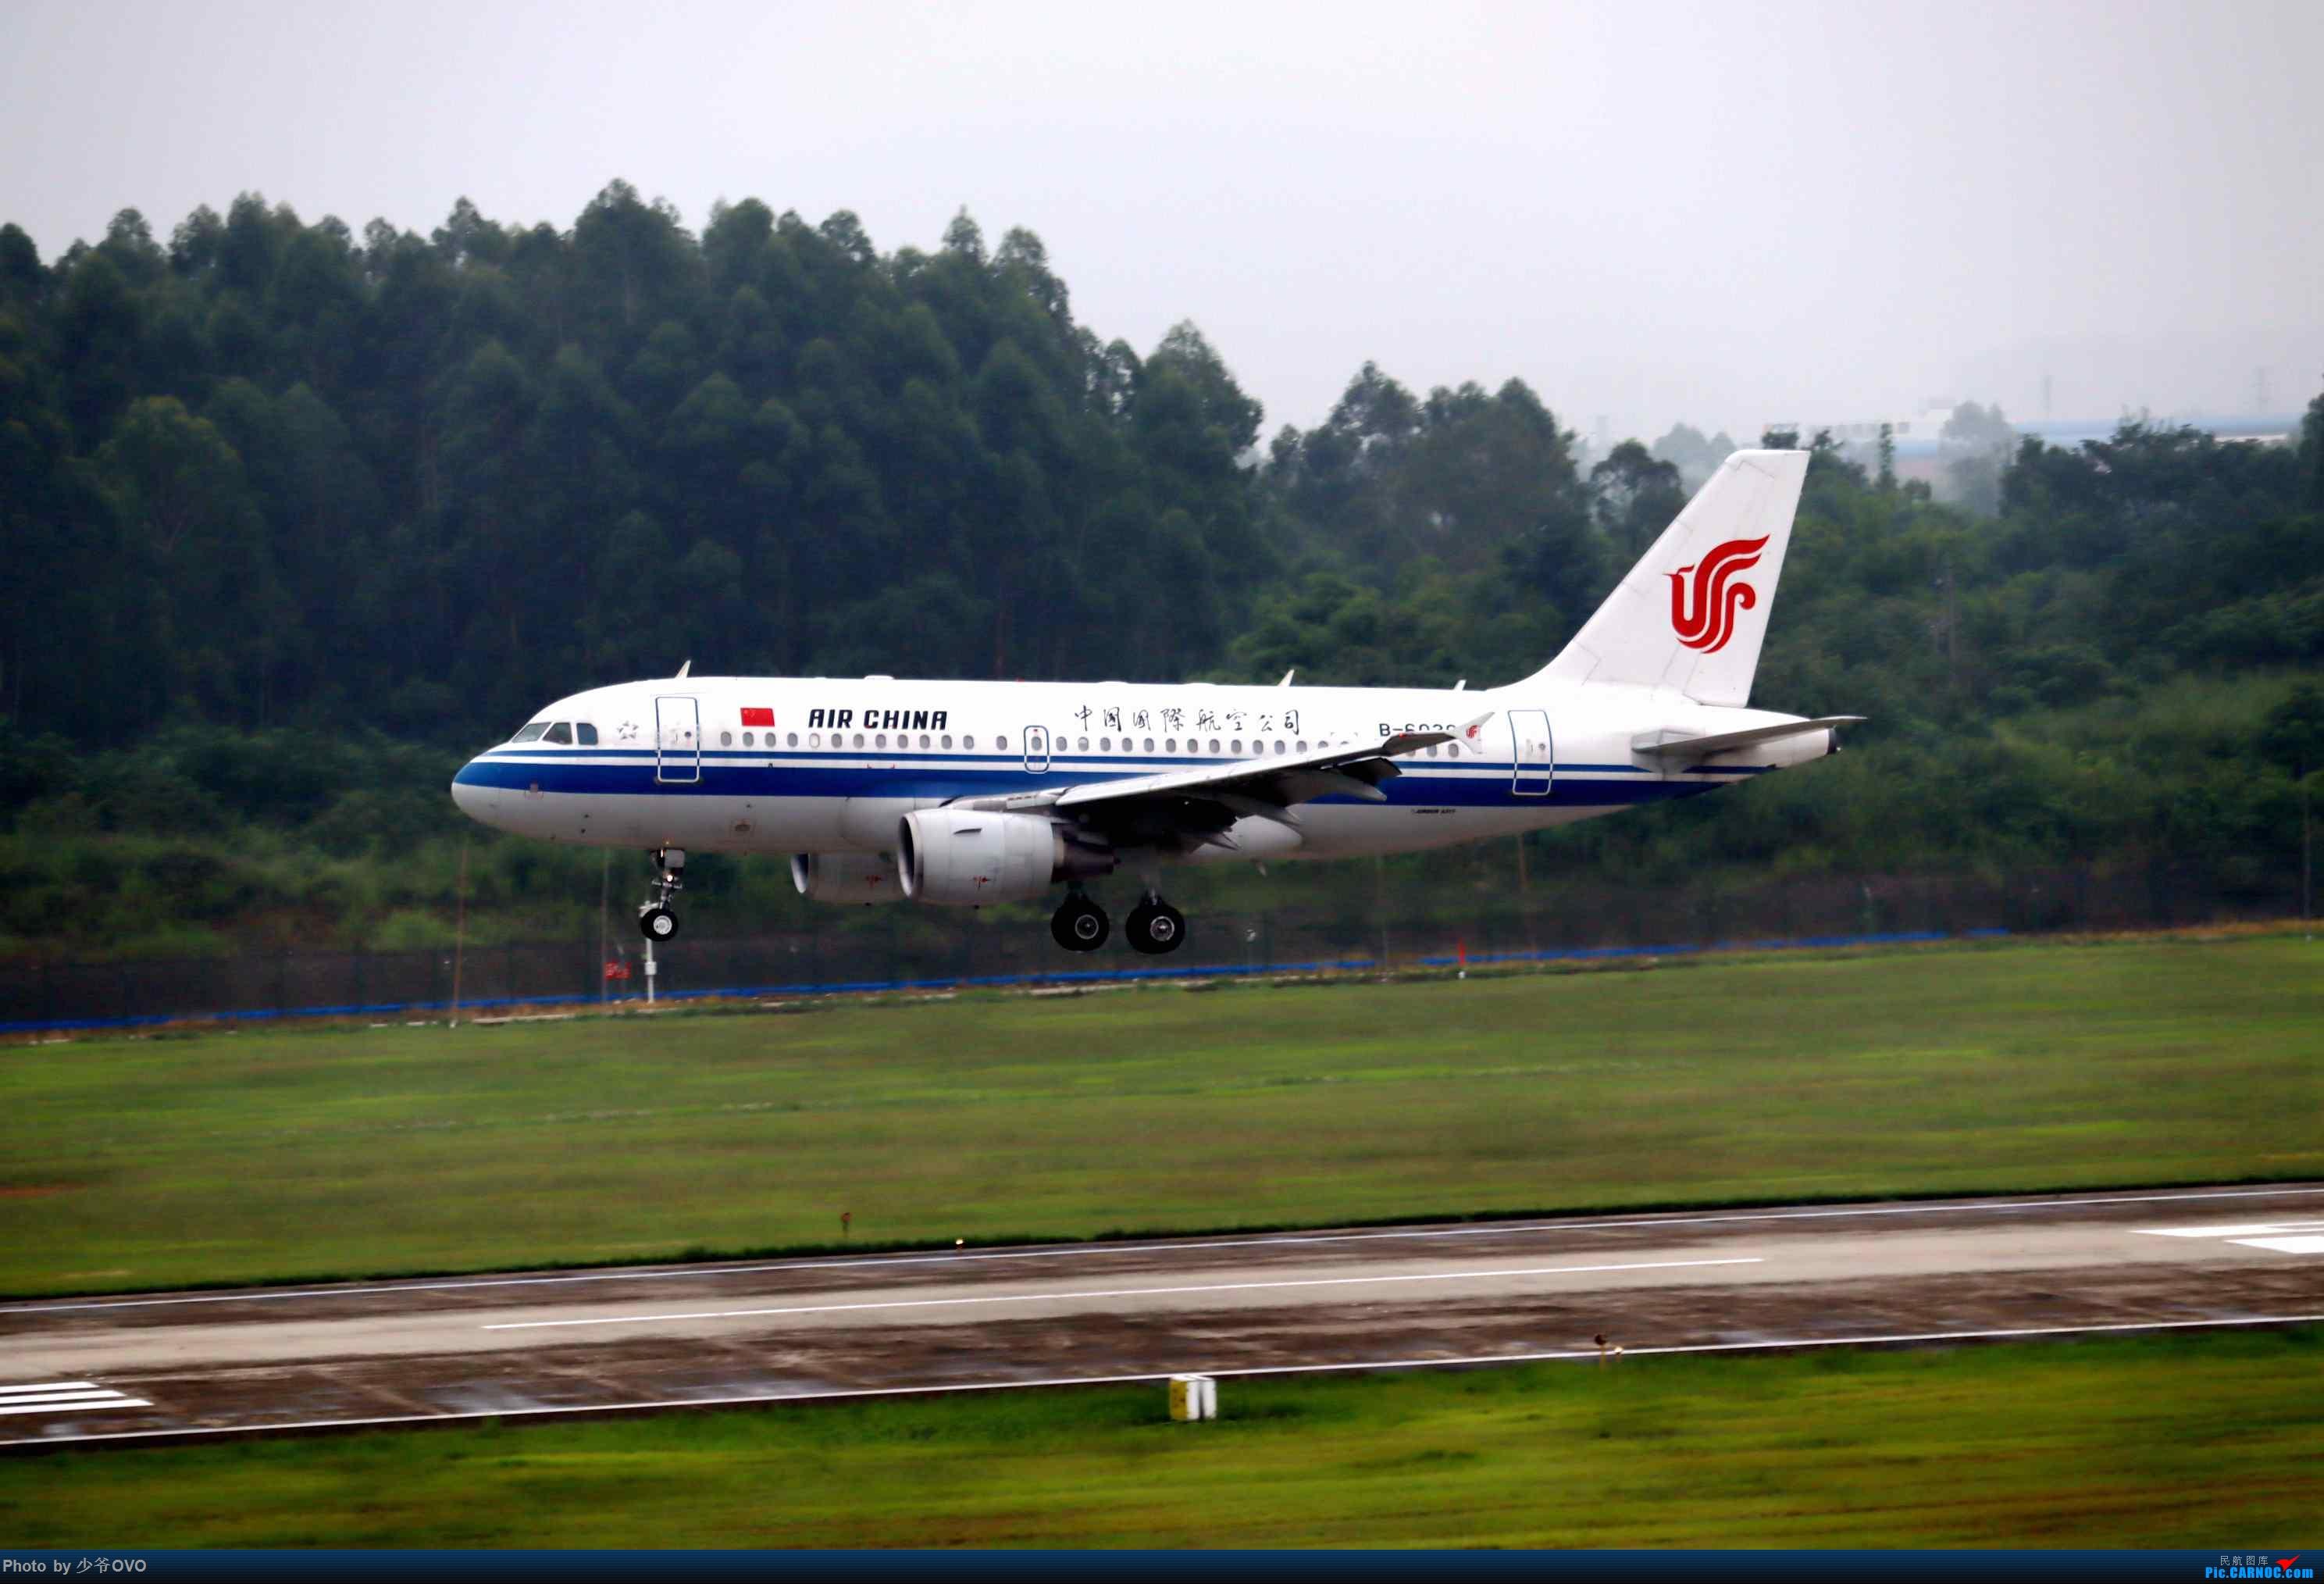 Re:[原创](2020.8.1)少爷的CTU拍机(厦门航空联合国787) AIRBUS A319-100 B-6036 中国成都双流国际机场